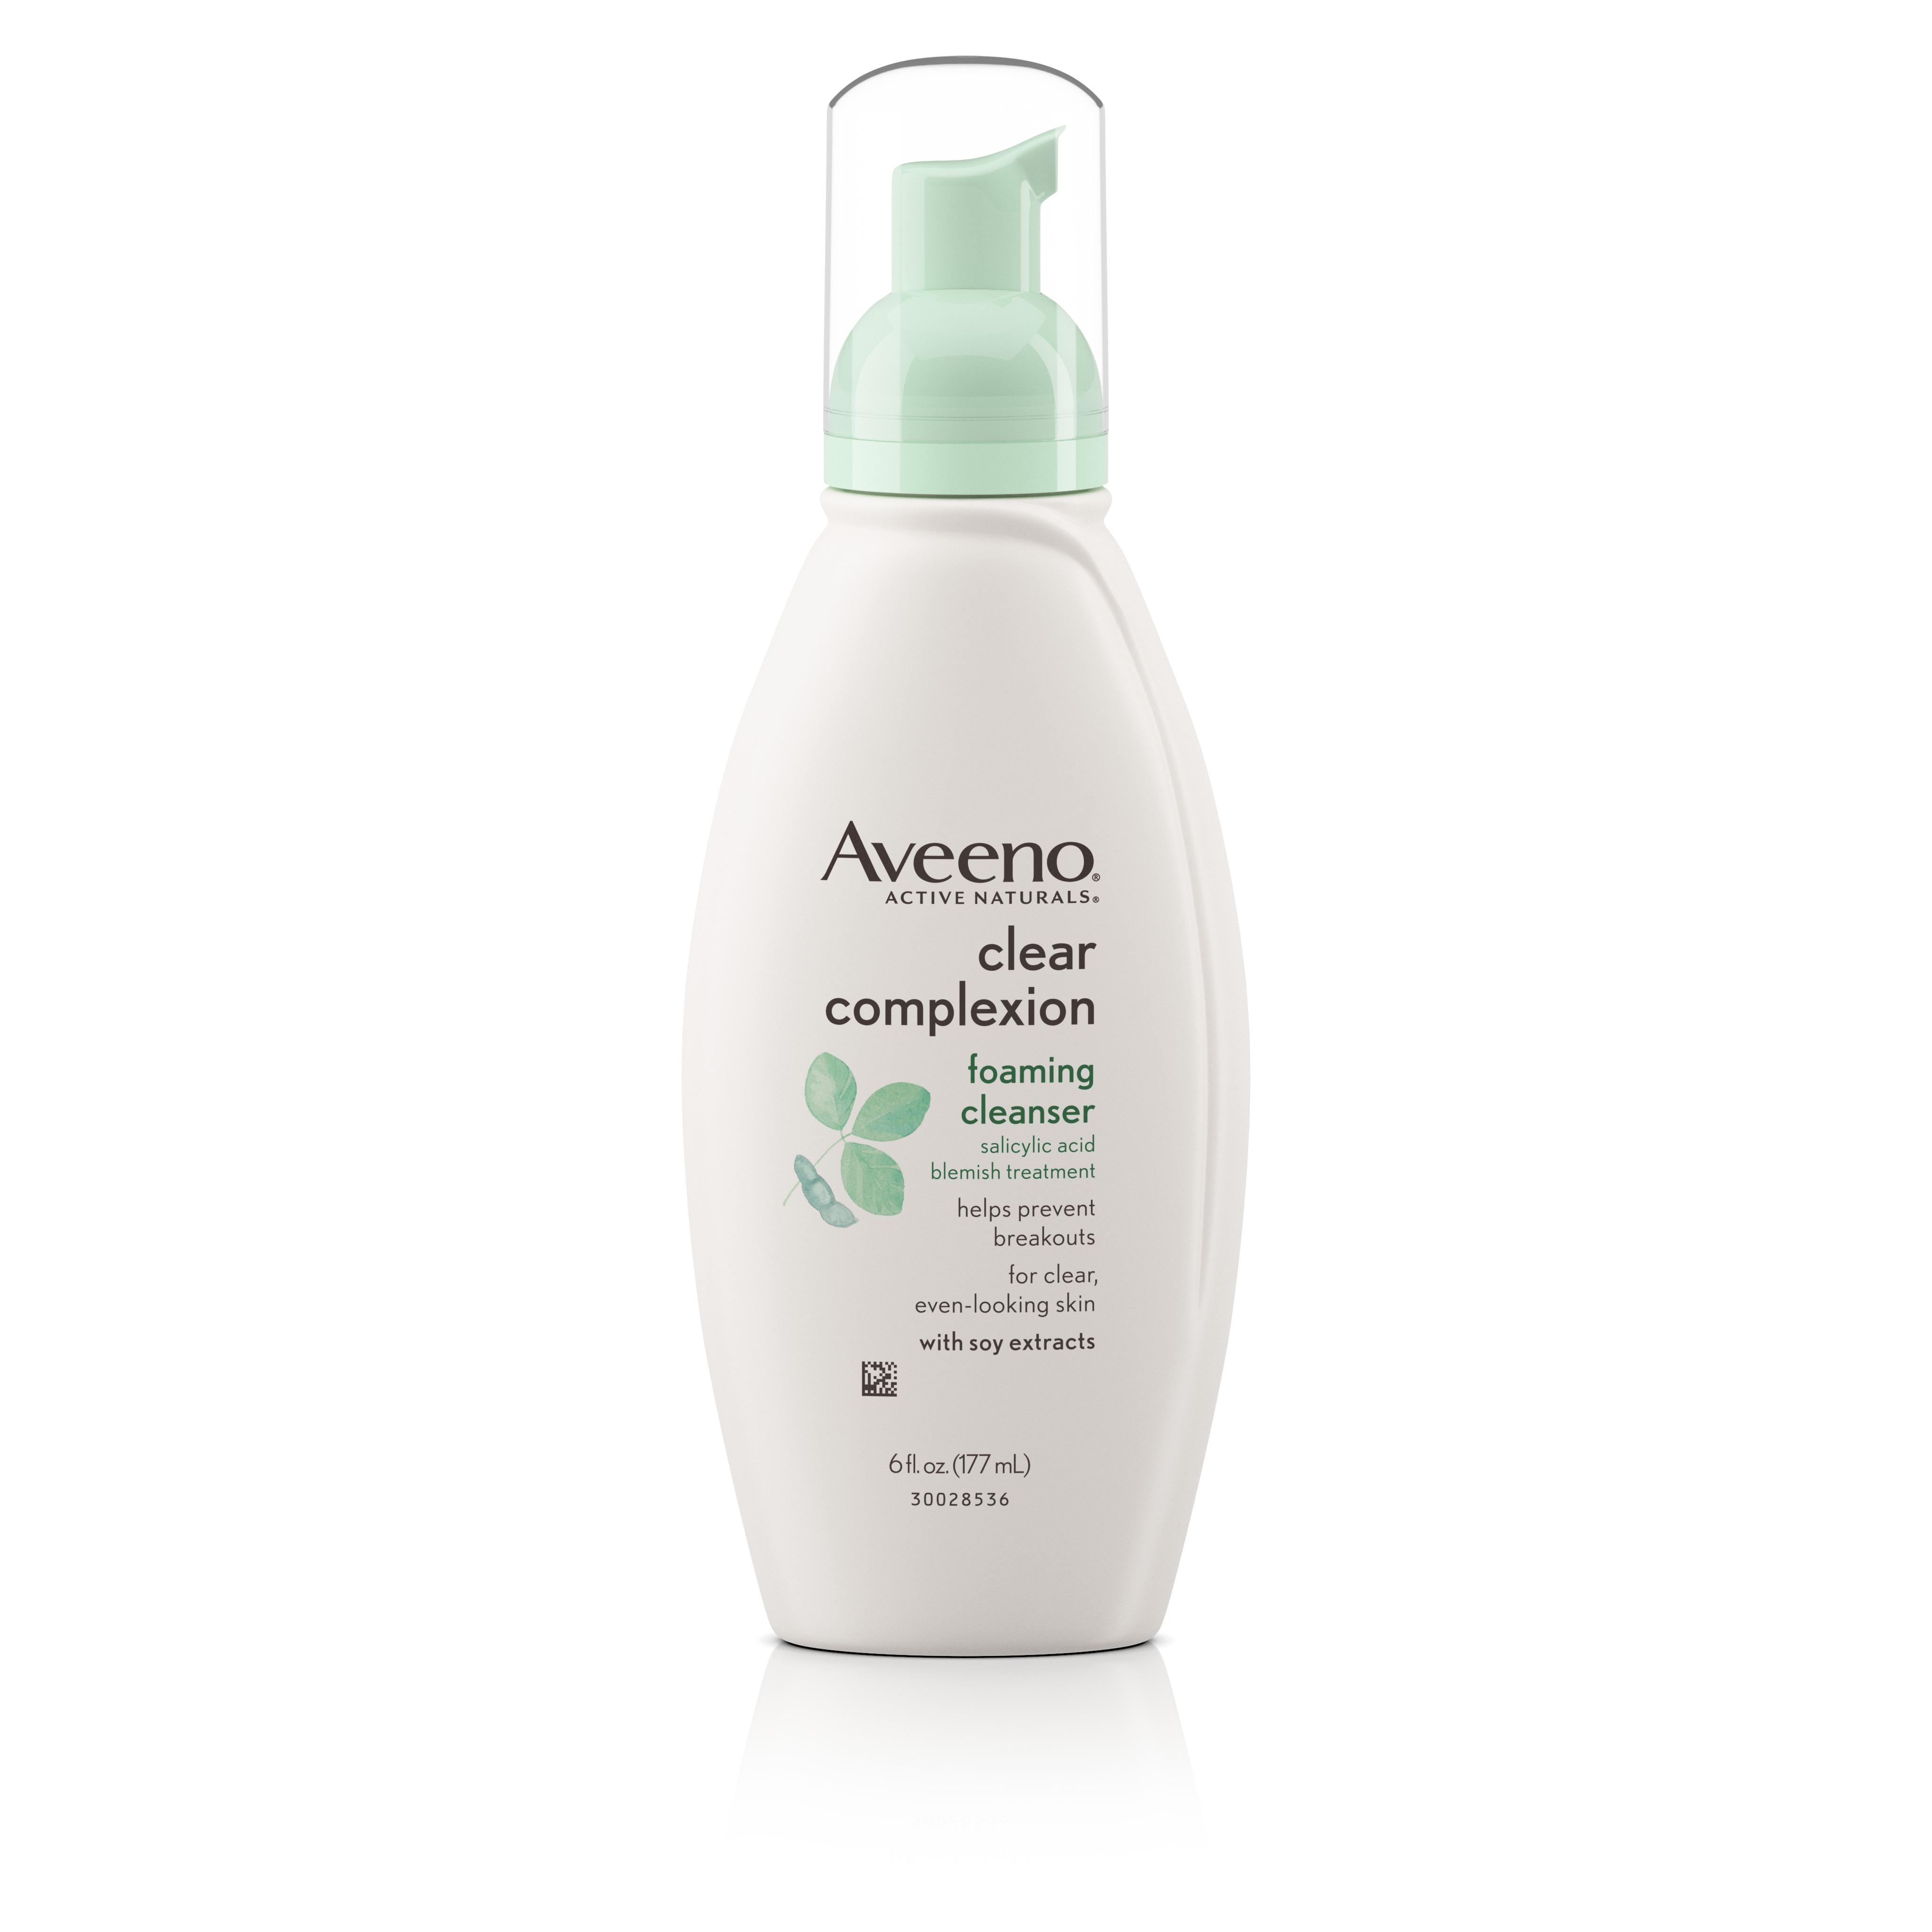 Aveeno Clear Complexion Foaming Facial Cleanser, 6 Fl. Oz - Walmart.com